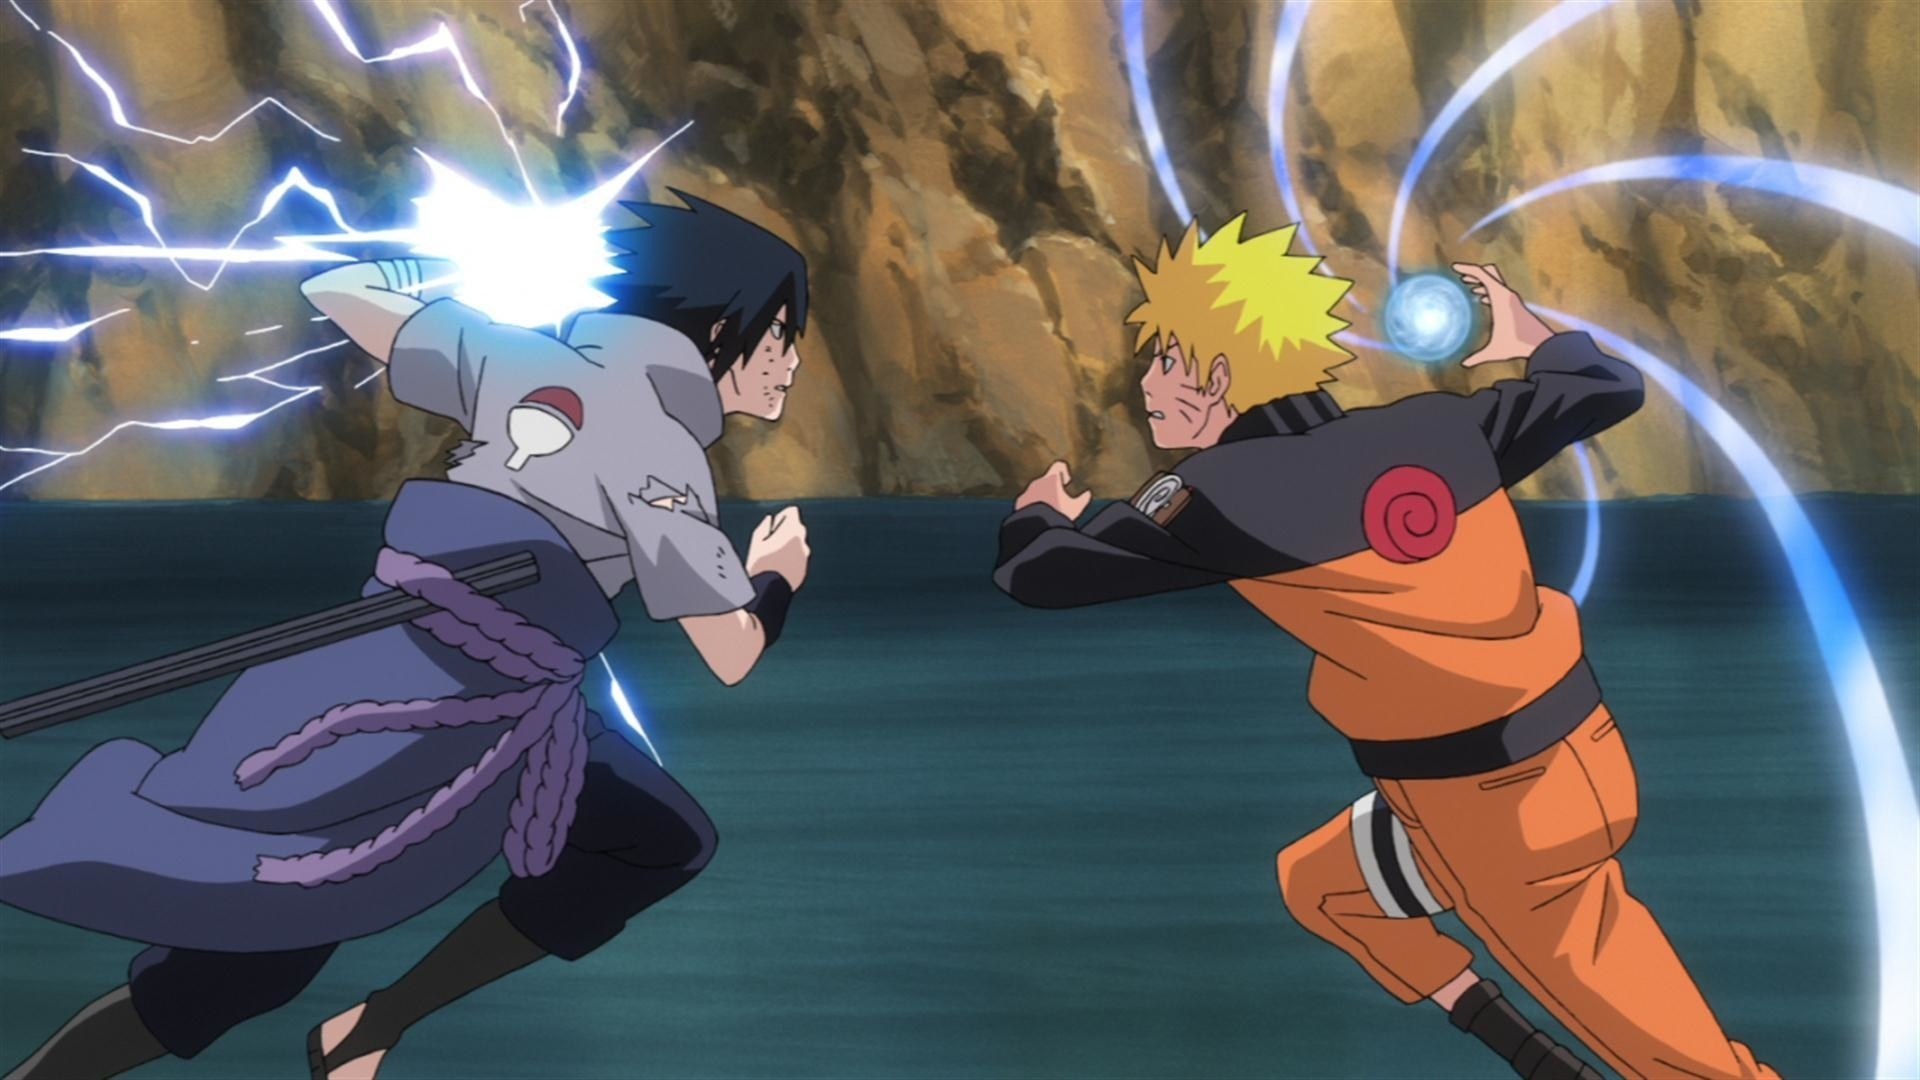 10 Top Naruto Vs Sasuke Final Battle Wallpaper FULL HD 1920×1080 For PC Background